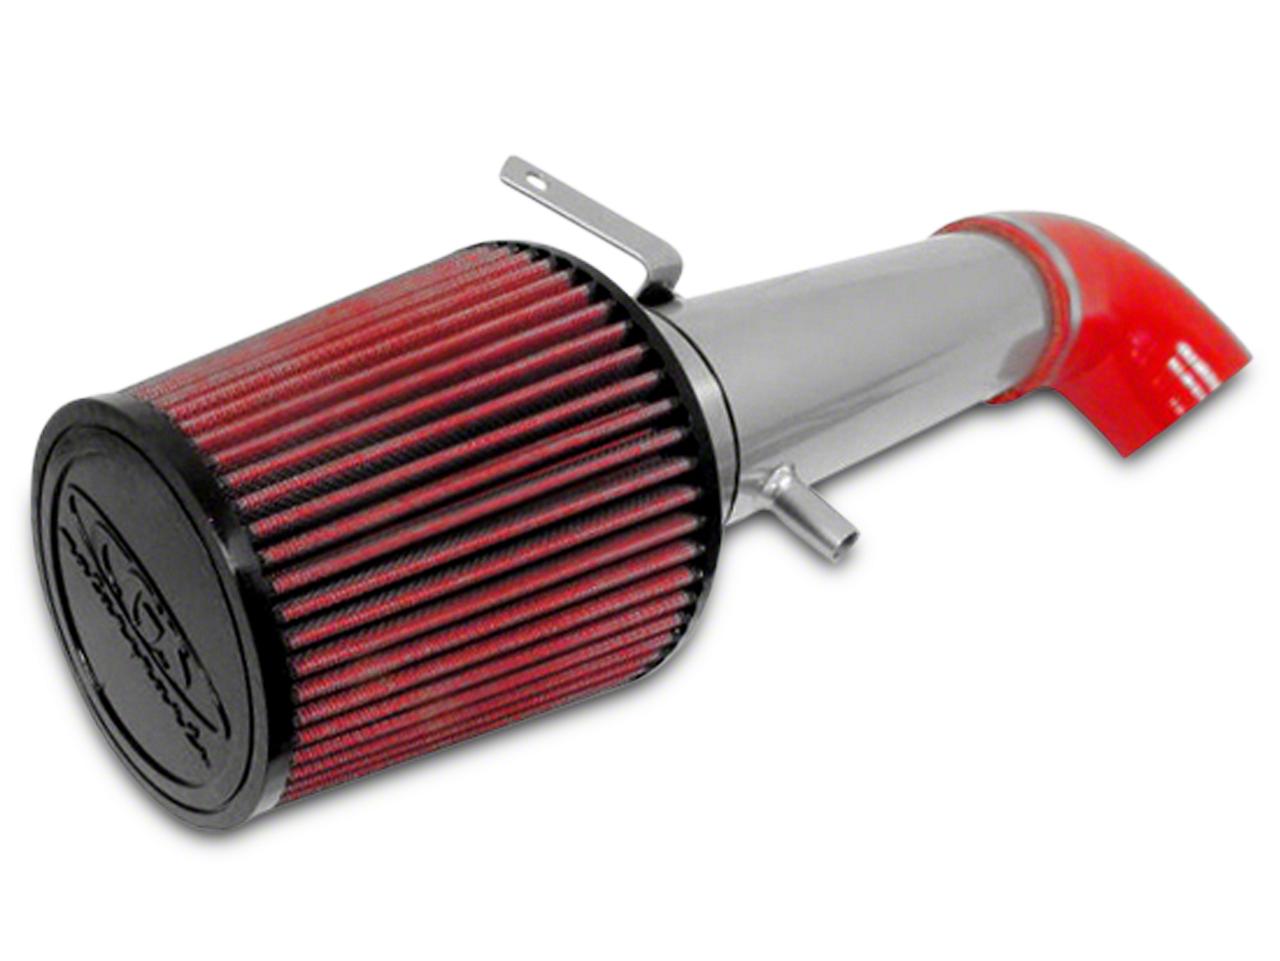 CGS Motorsports Cold Air Intake - Ceramic Silver (07-08 4.8L, 5.3L, 6.0L)